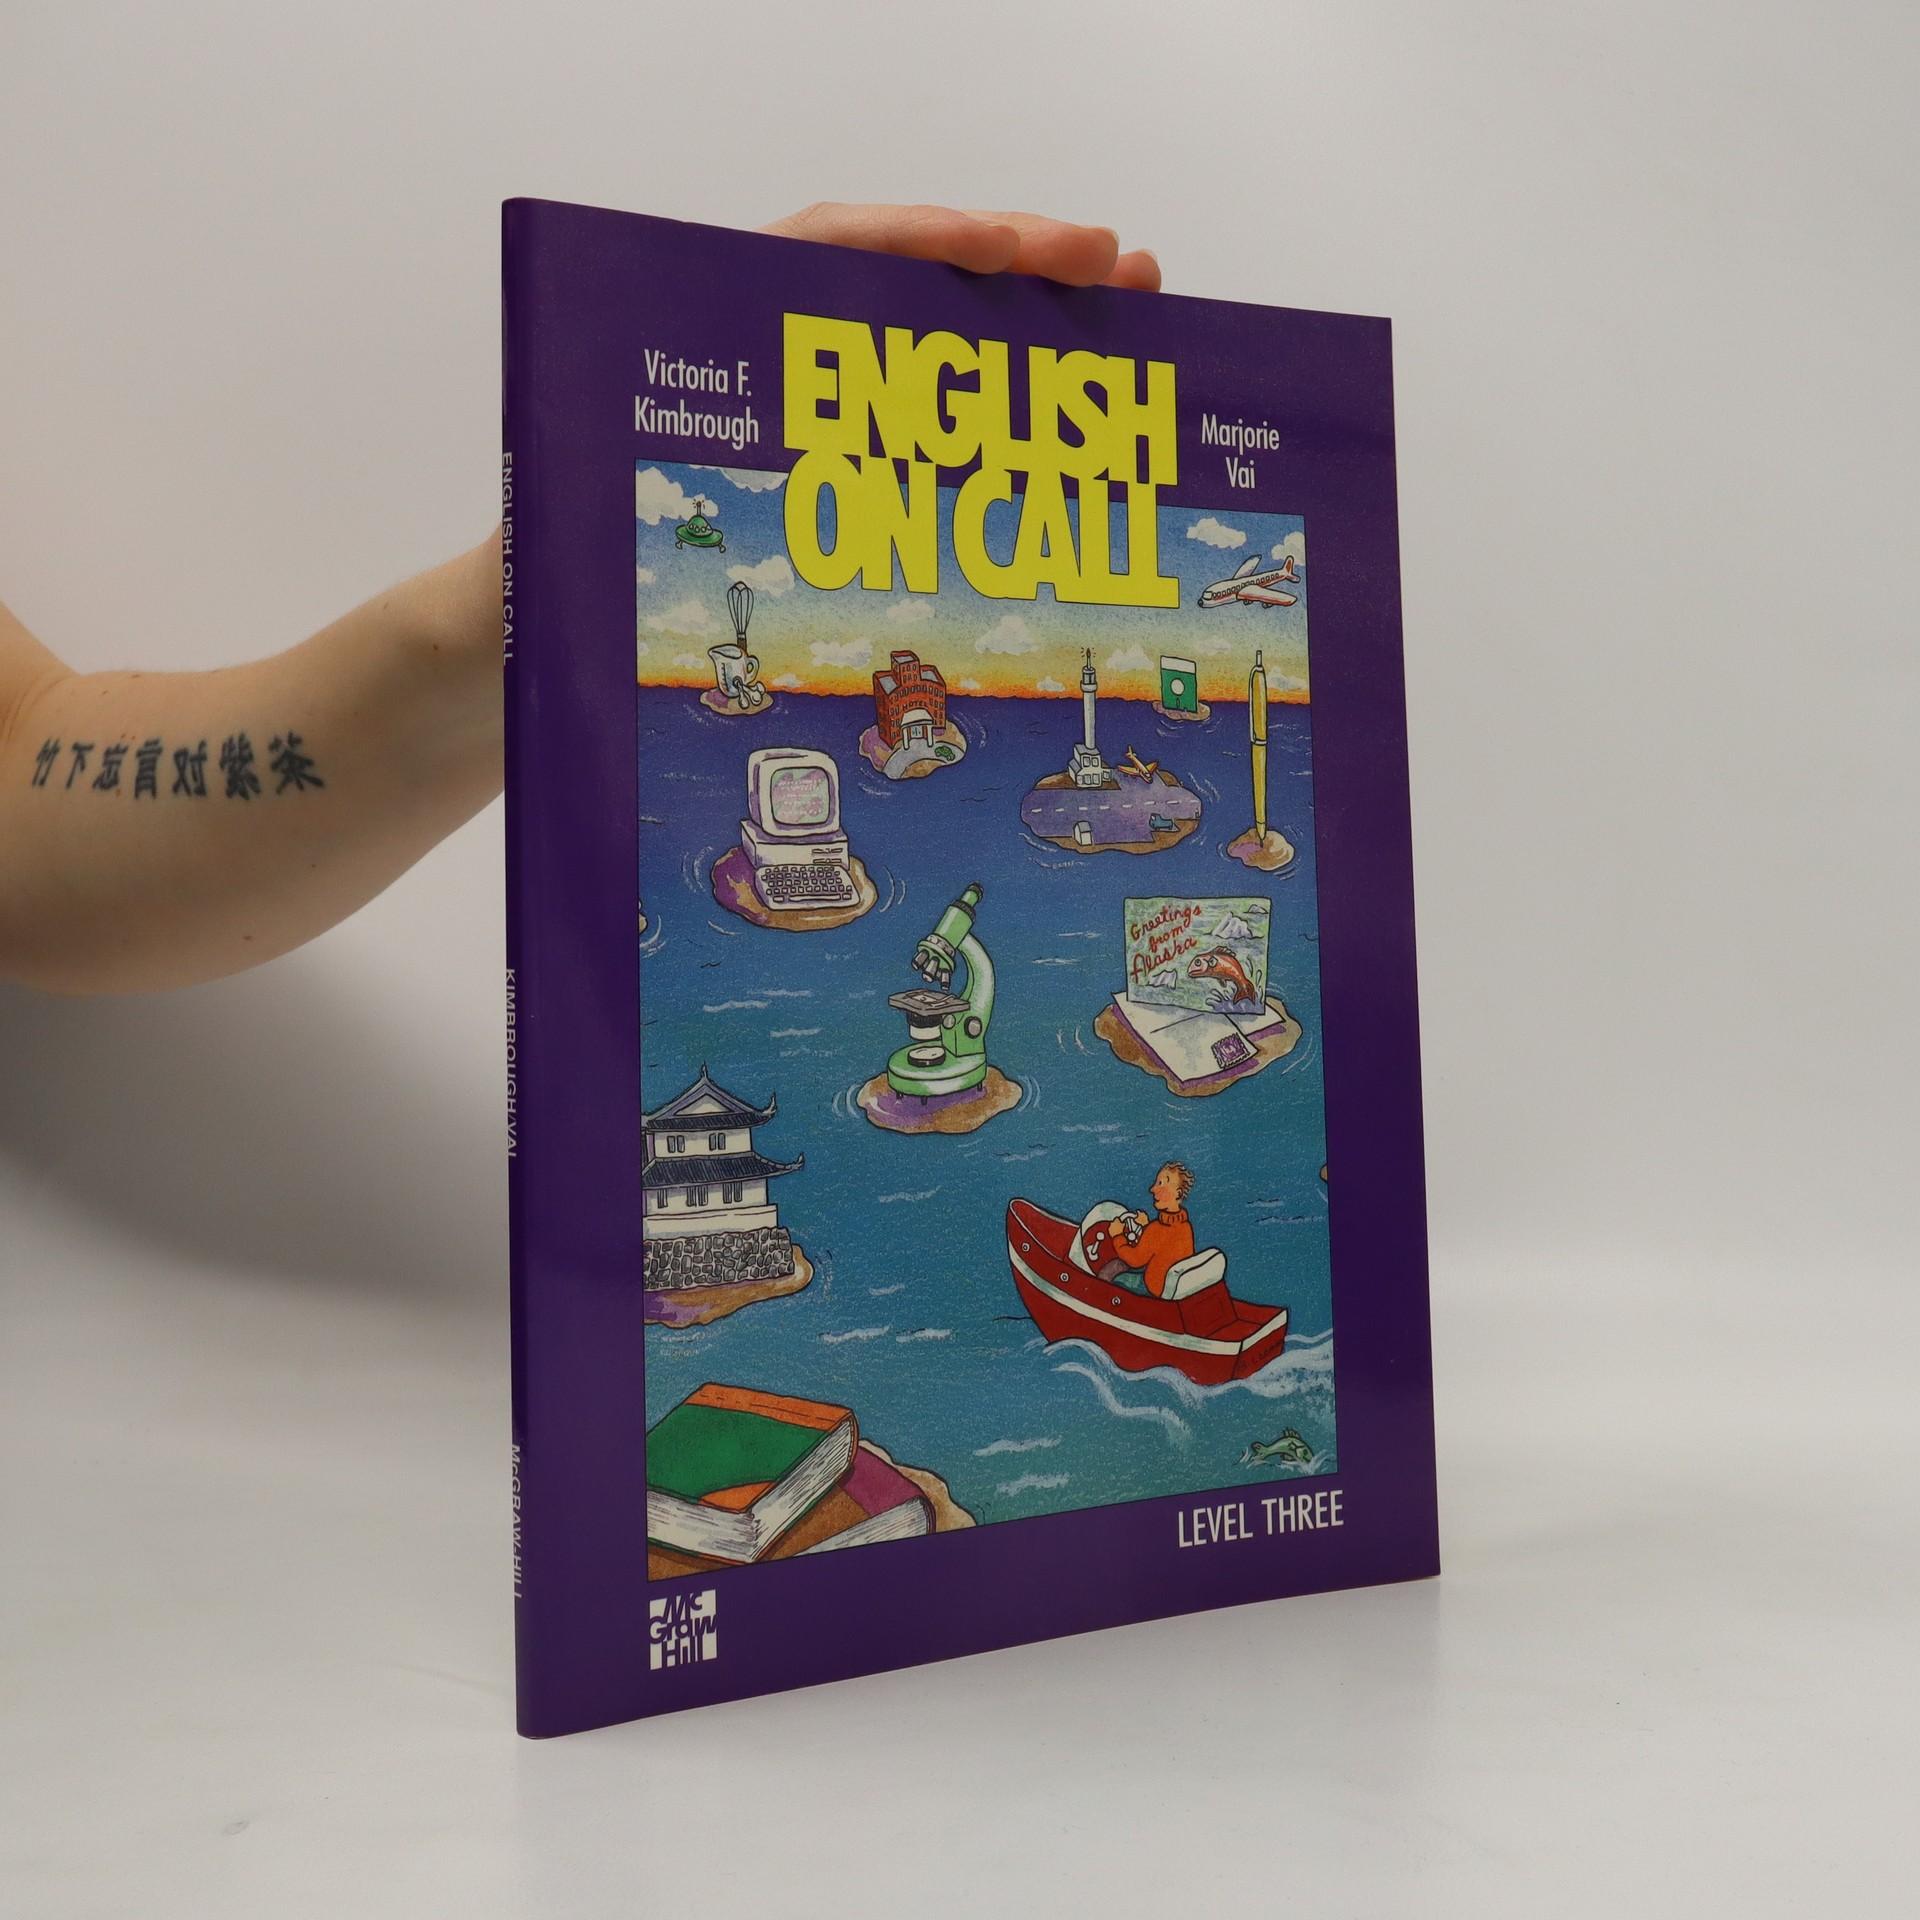 antikvární kniha English on call : level three, neuveden